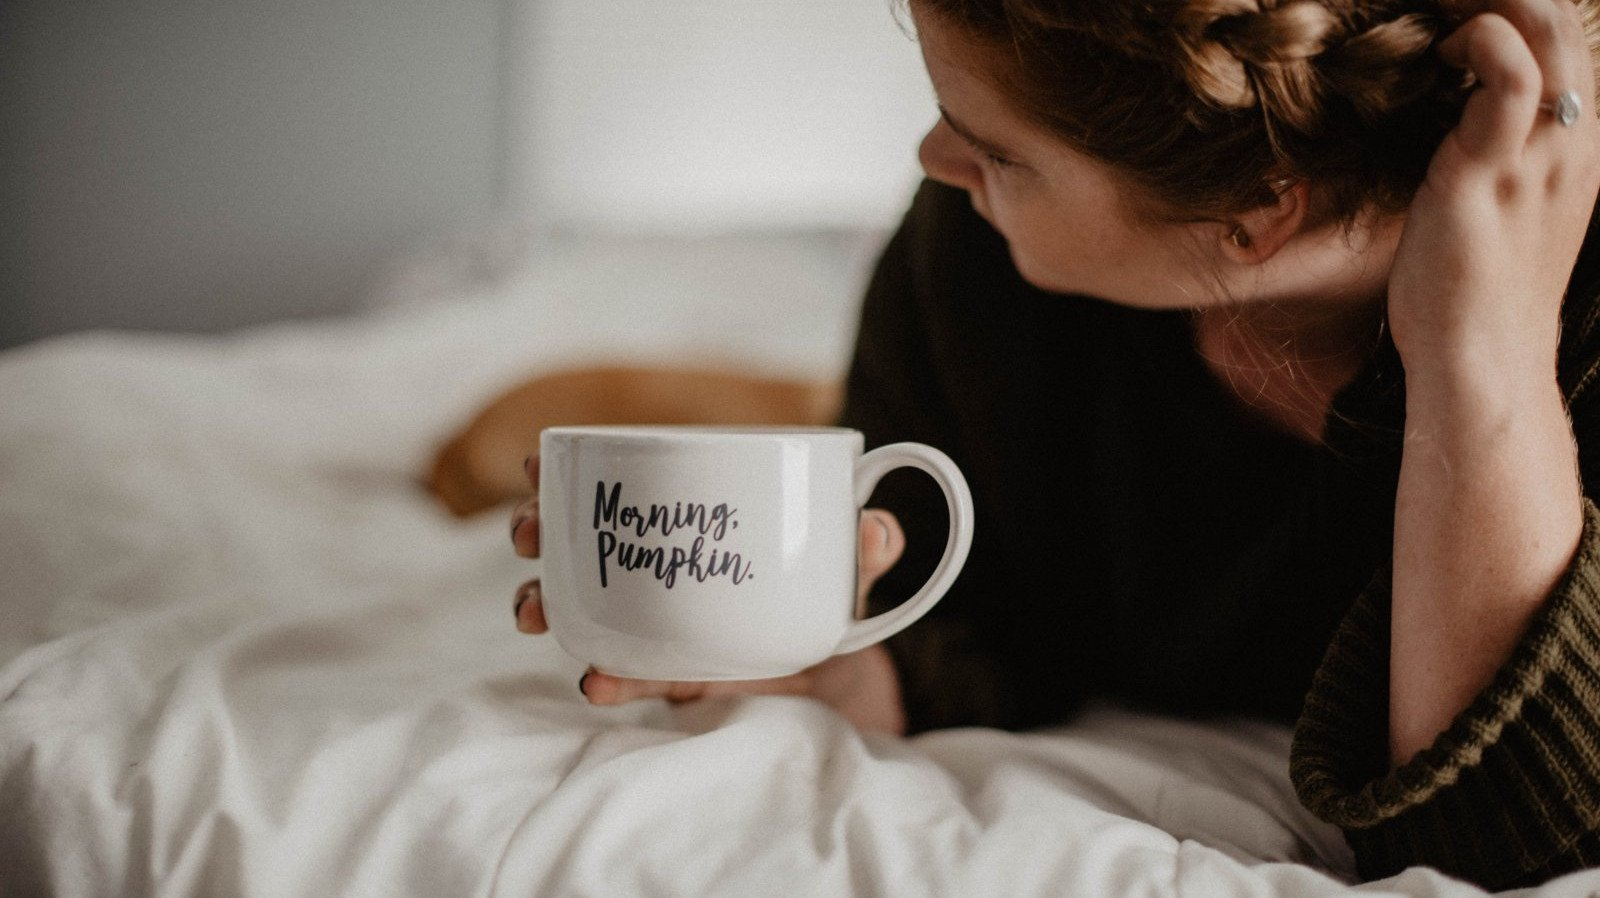 ¡Aplica estos consejos para disfrutar de levantarte cada mañana!